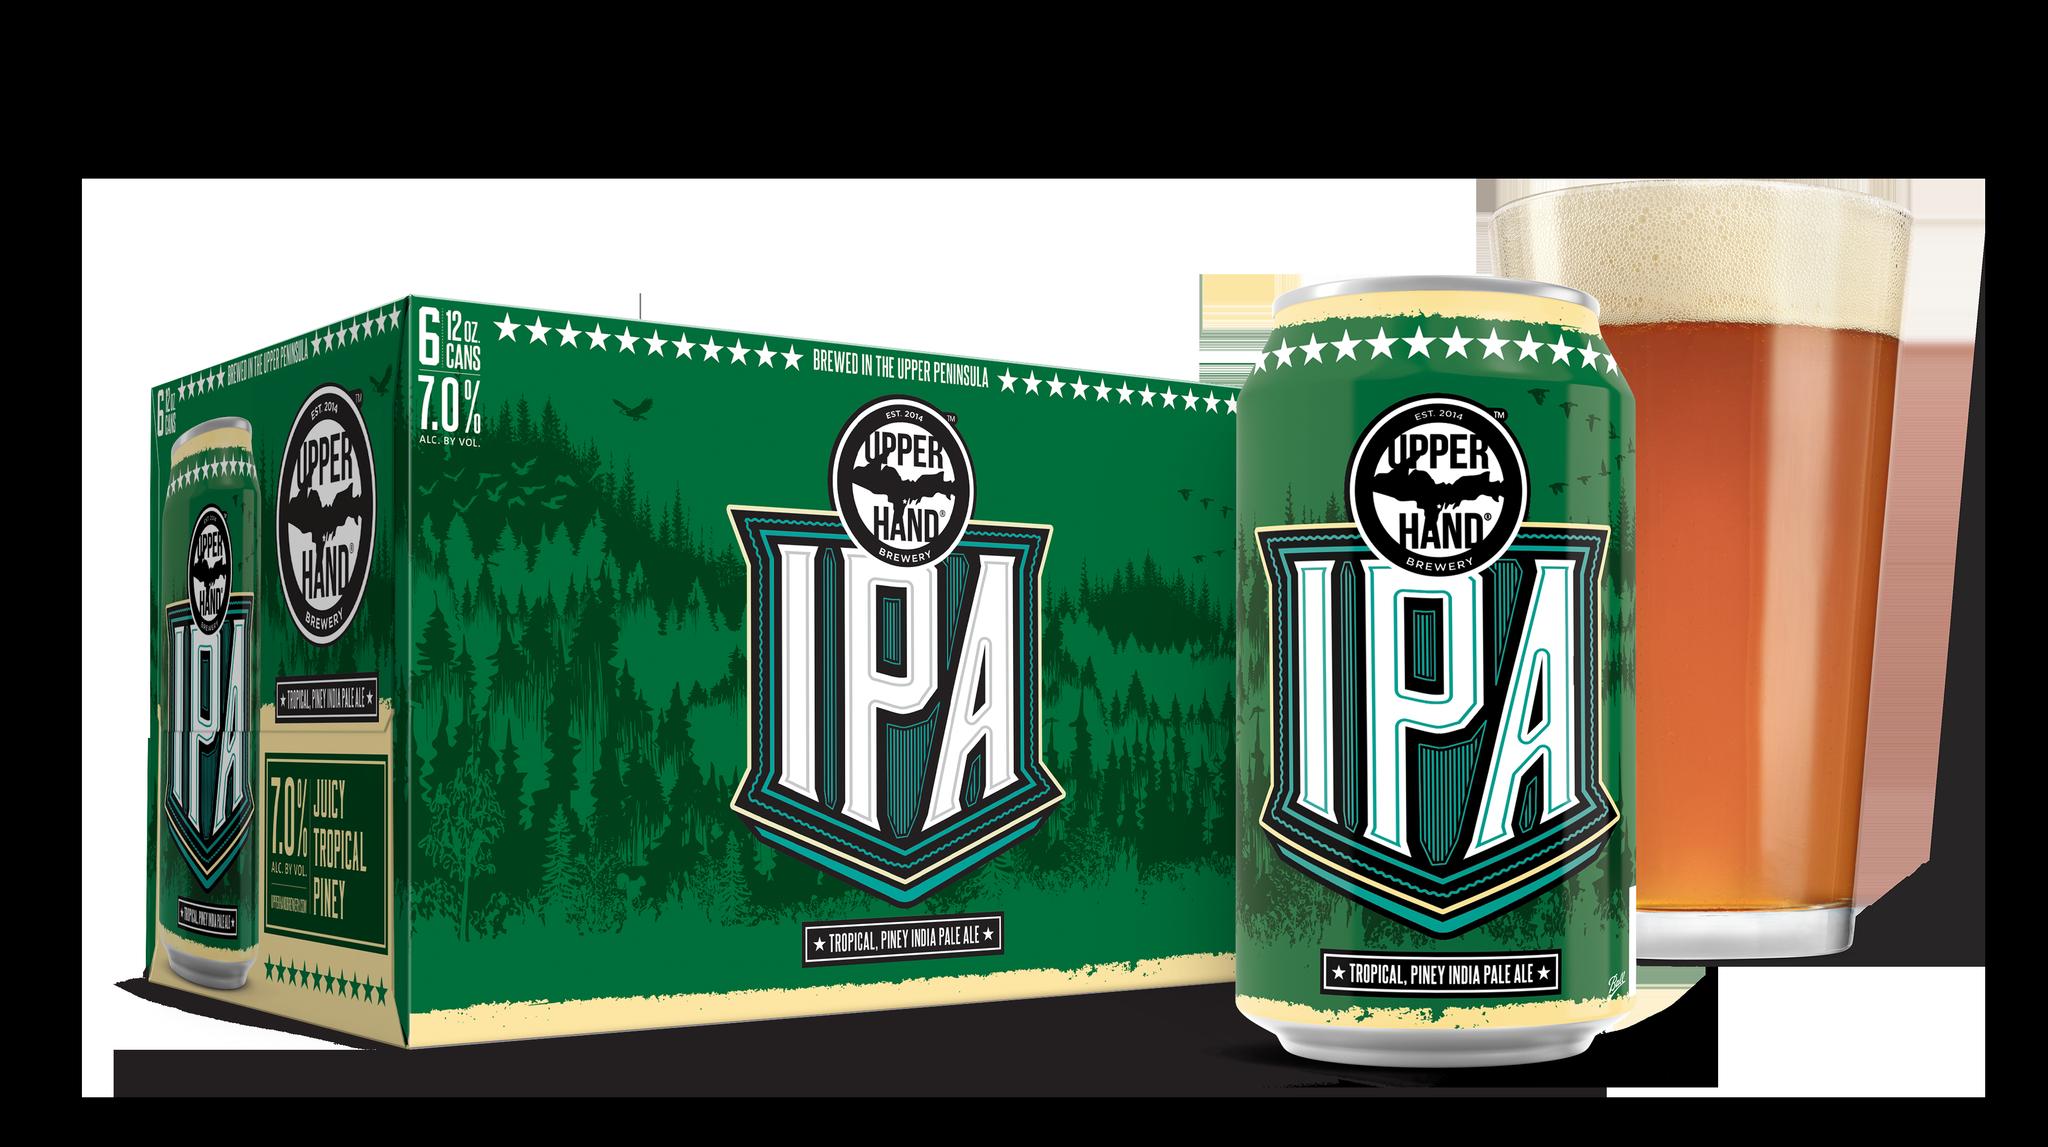 Upper Hand<span class='trade'>®</span> IPA Brand Rendering